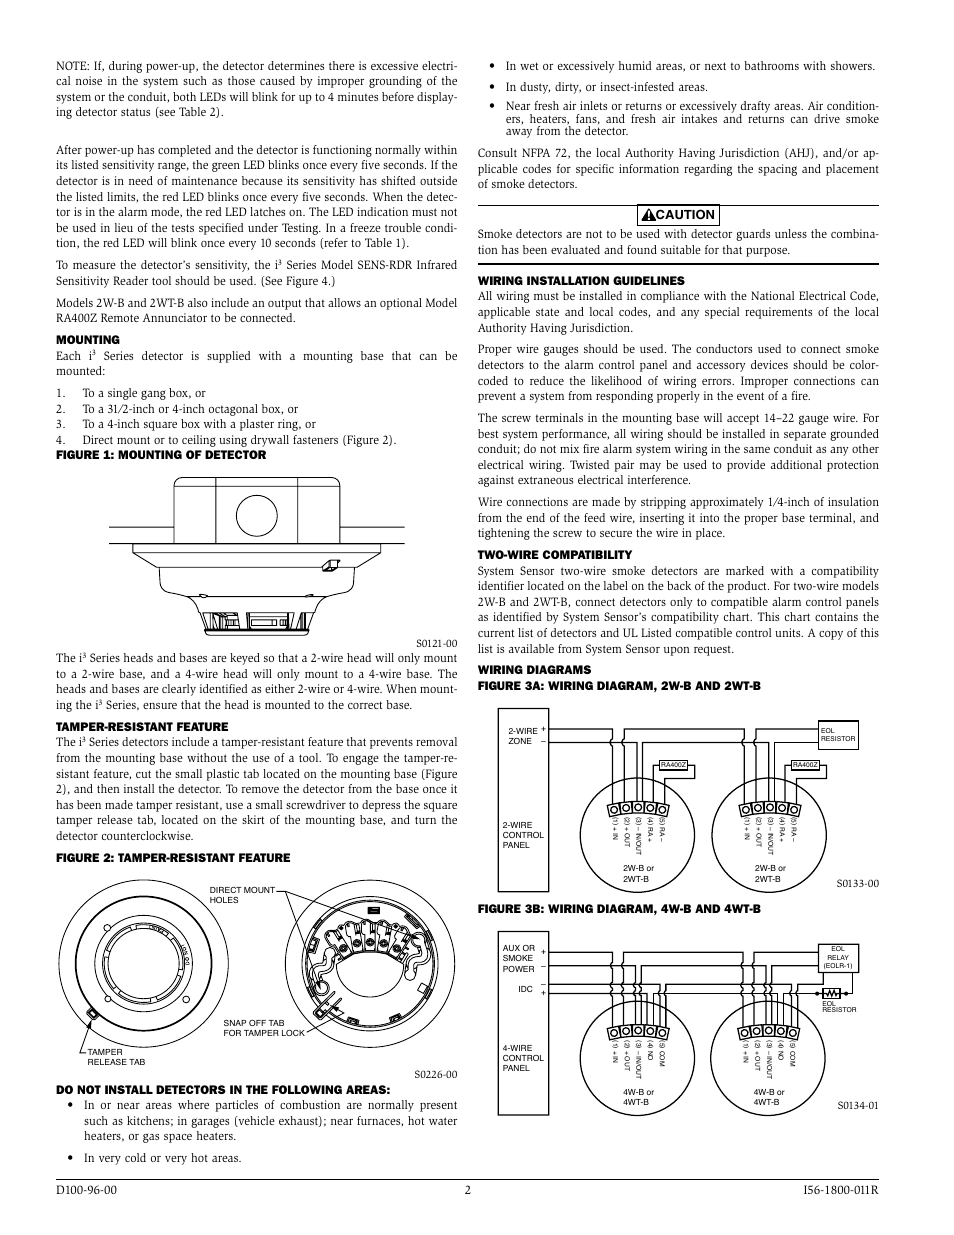 medium resolution of system sensor wiring diagram wiring diagram data schema system sensor horn strobe wiring diagram the